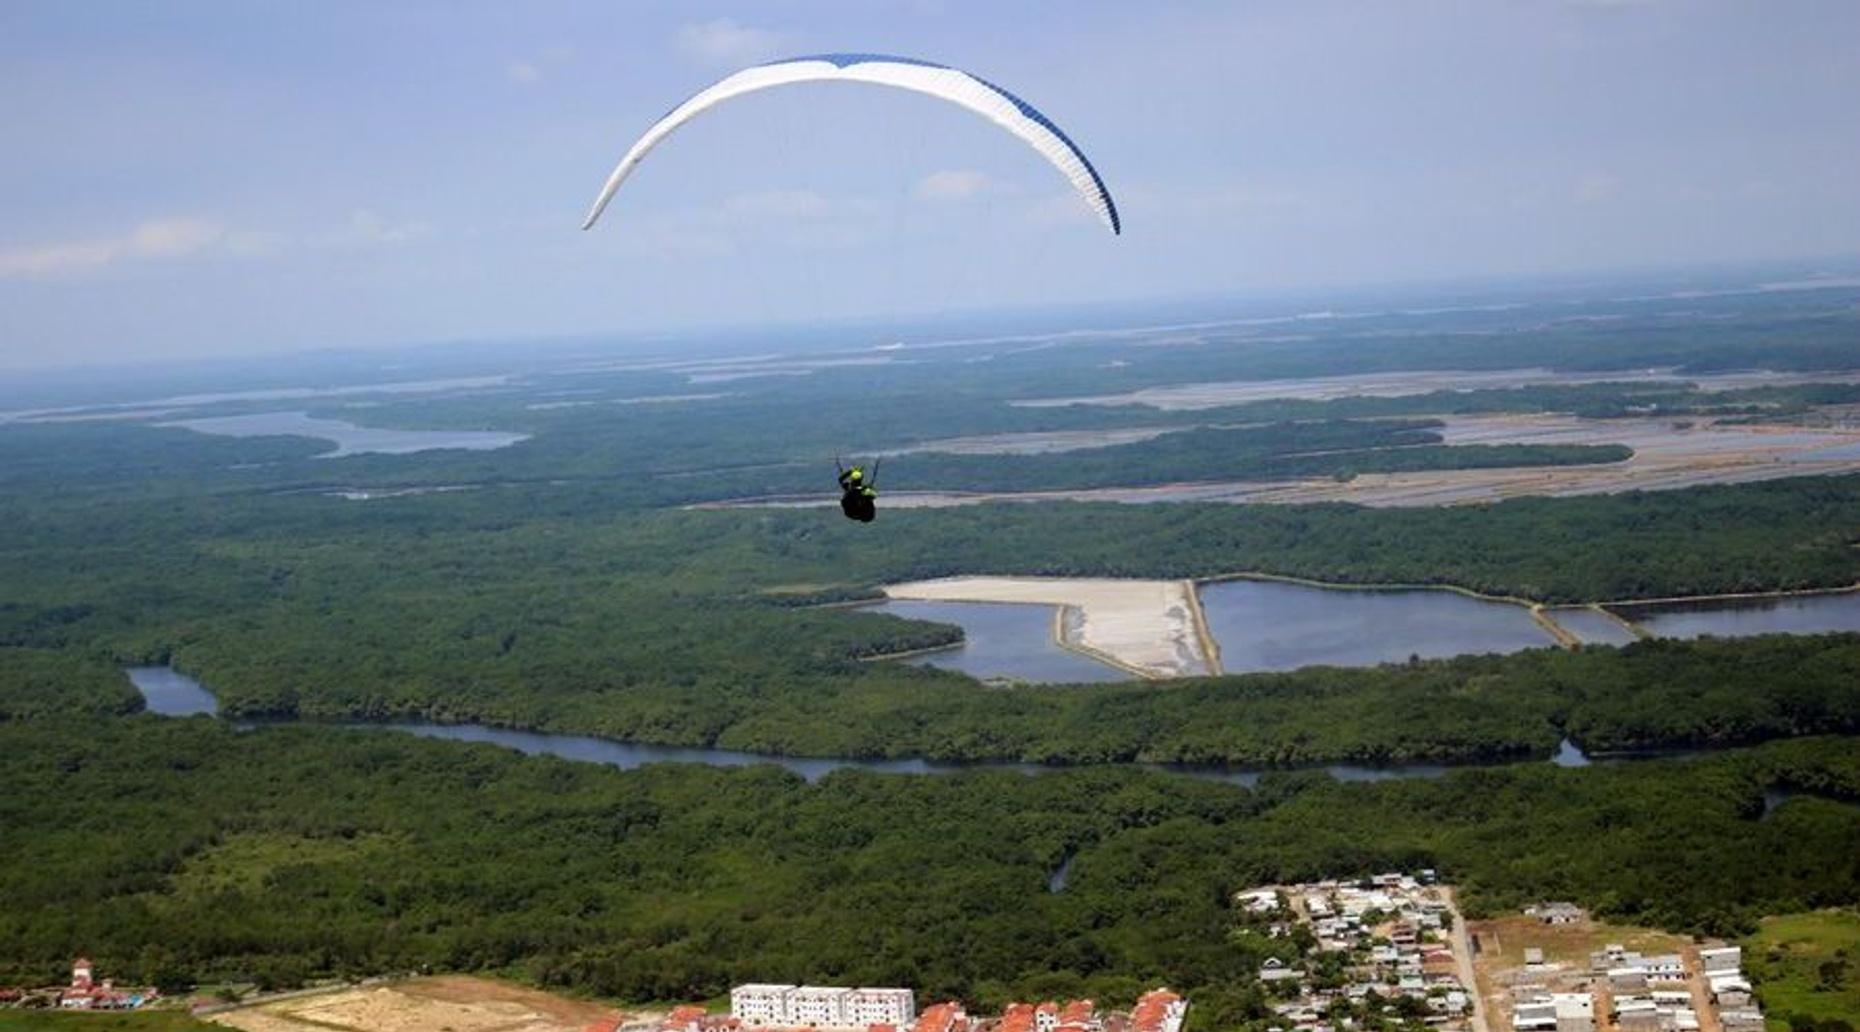 Guayaquil Paragliding Flight